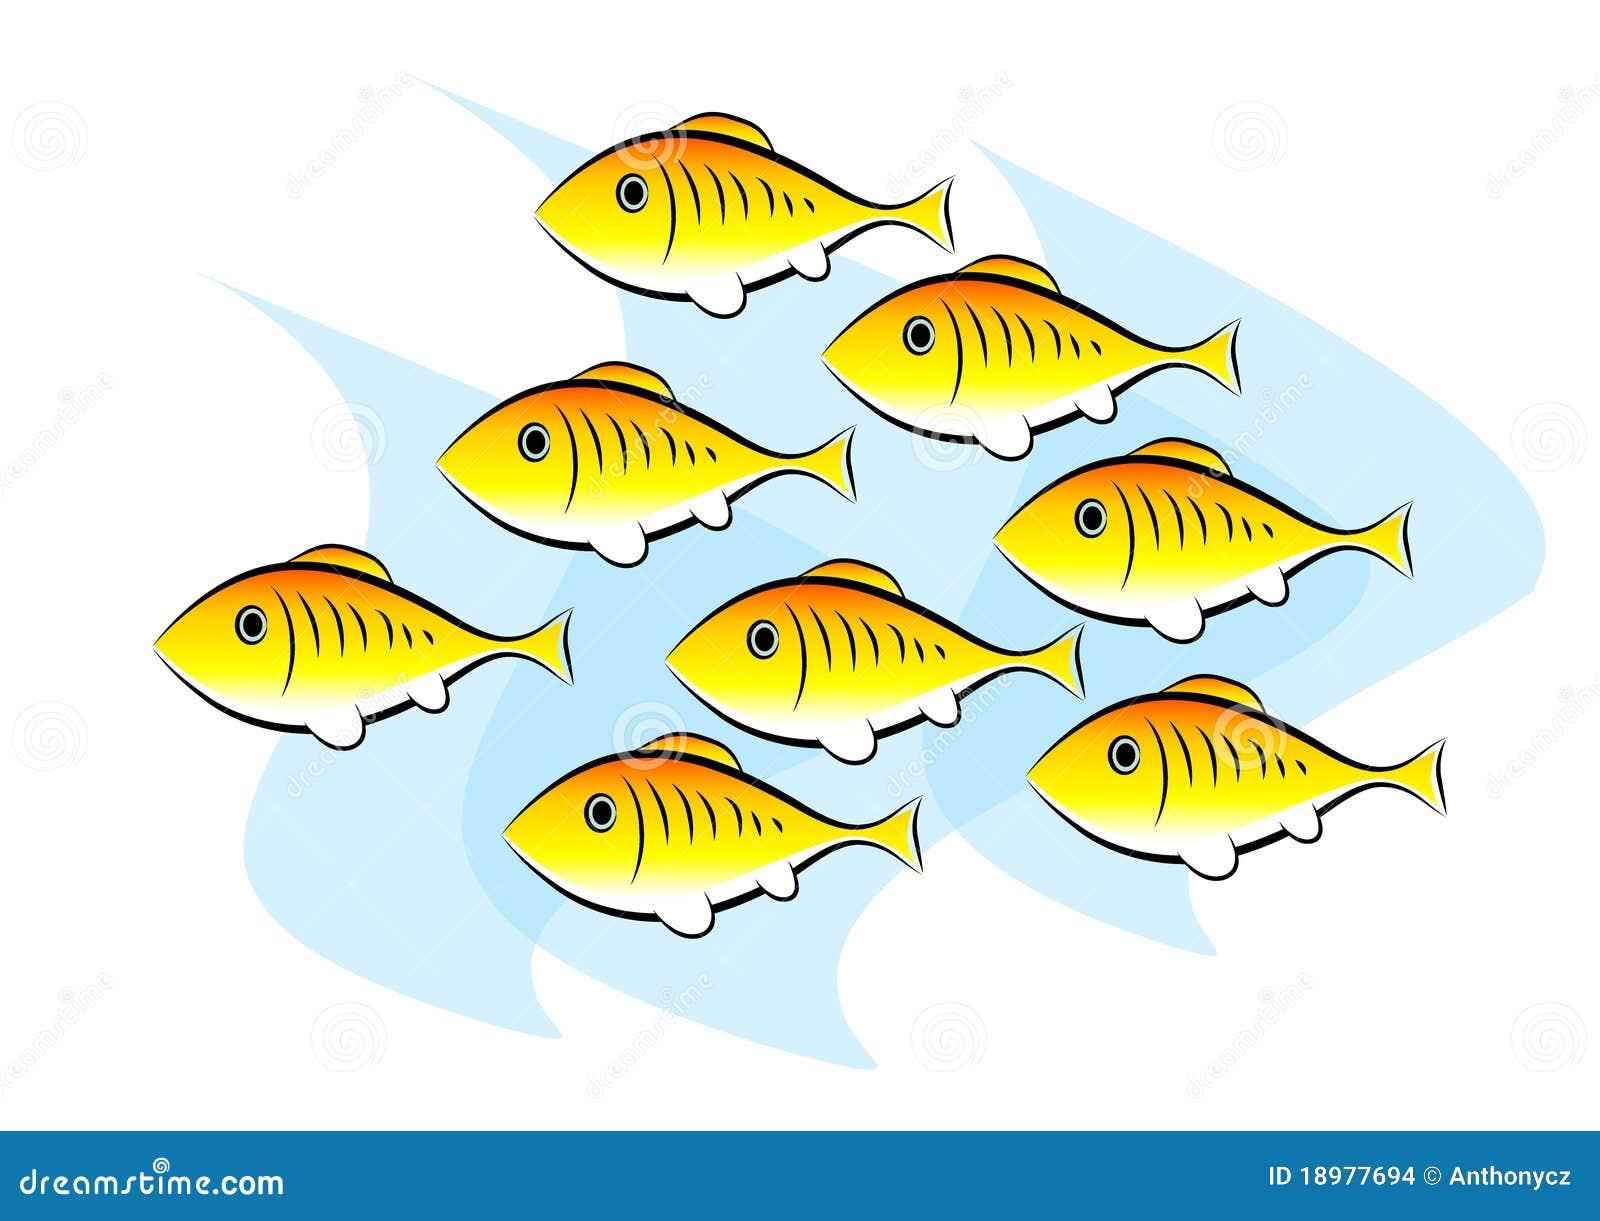 clip art of fish stock vector illustration of water 18977694 rh dreamstime com school of fish clipart free school of fish clipart free